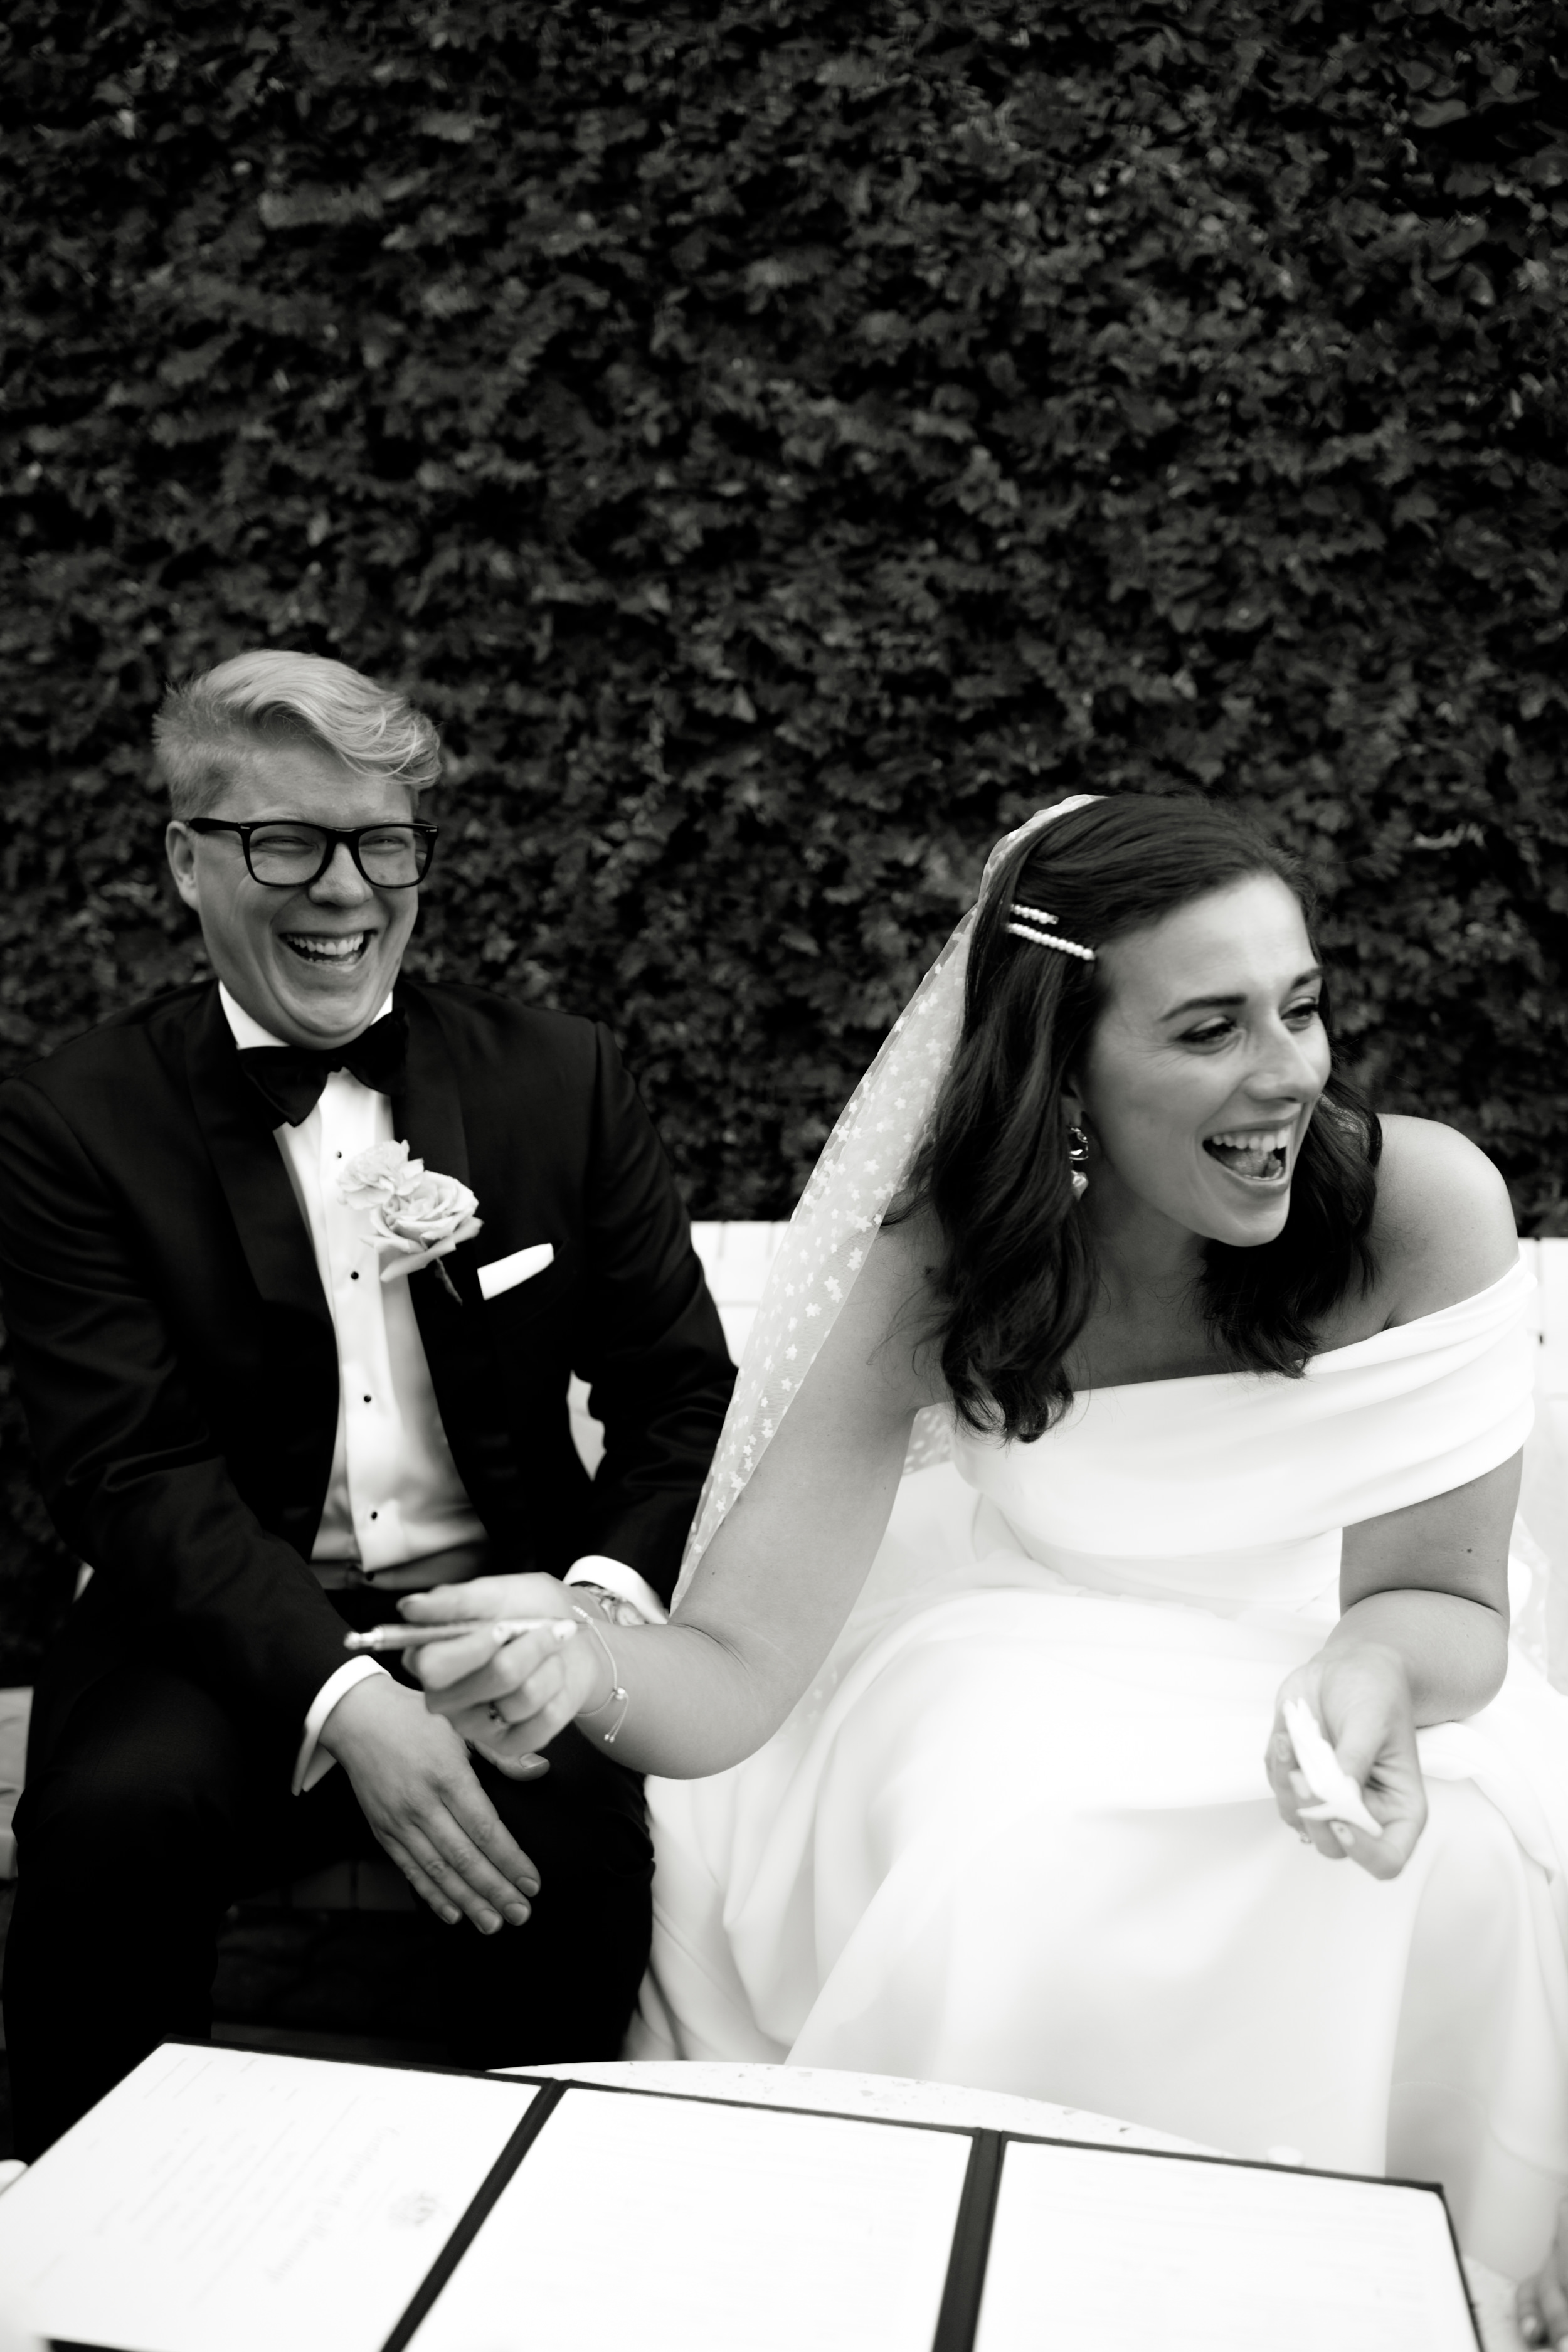 I-Got-You-Babe-Weddings-Tahlia&Mitch-Butler-Lane-Wedding0111.JPG